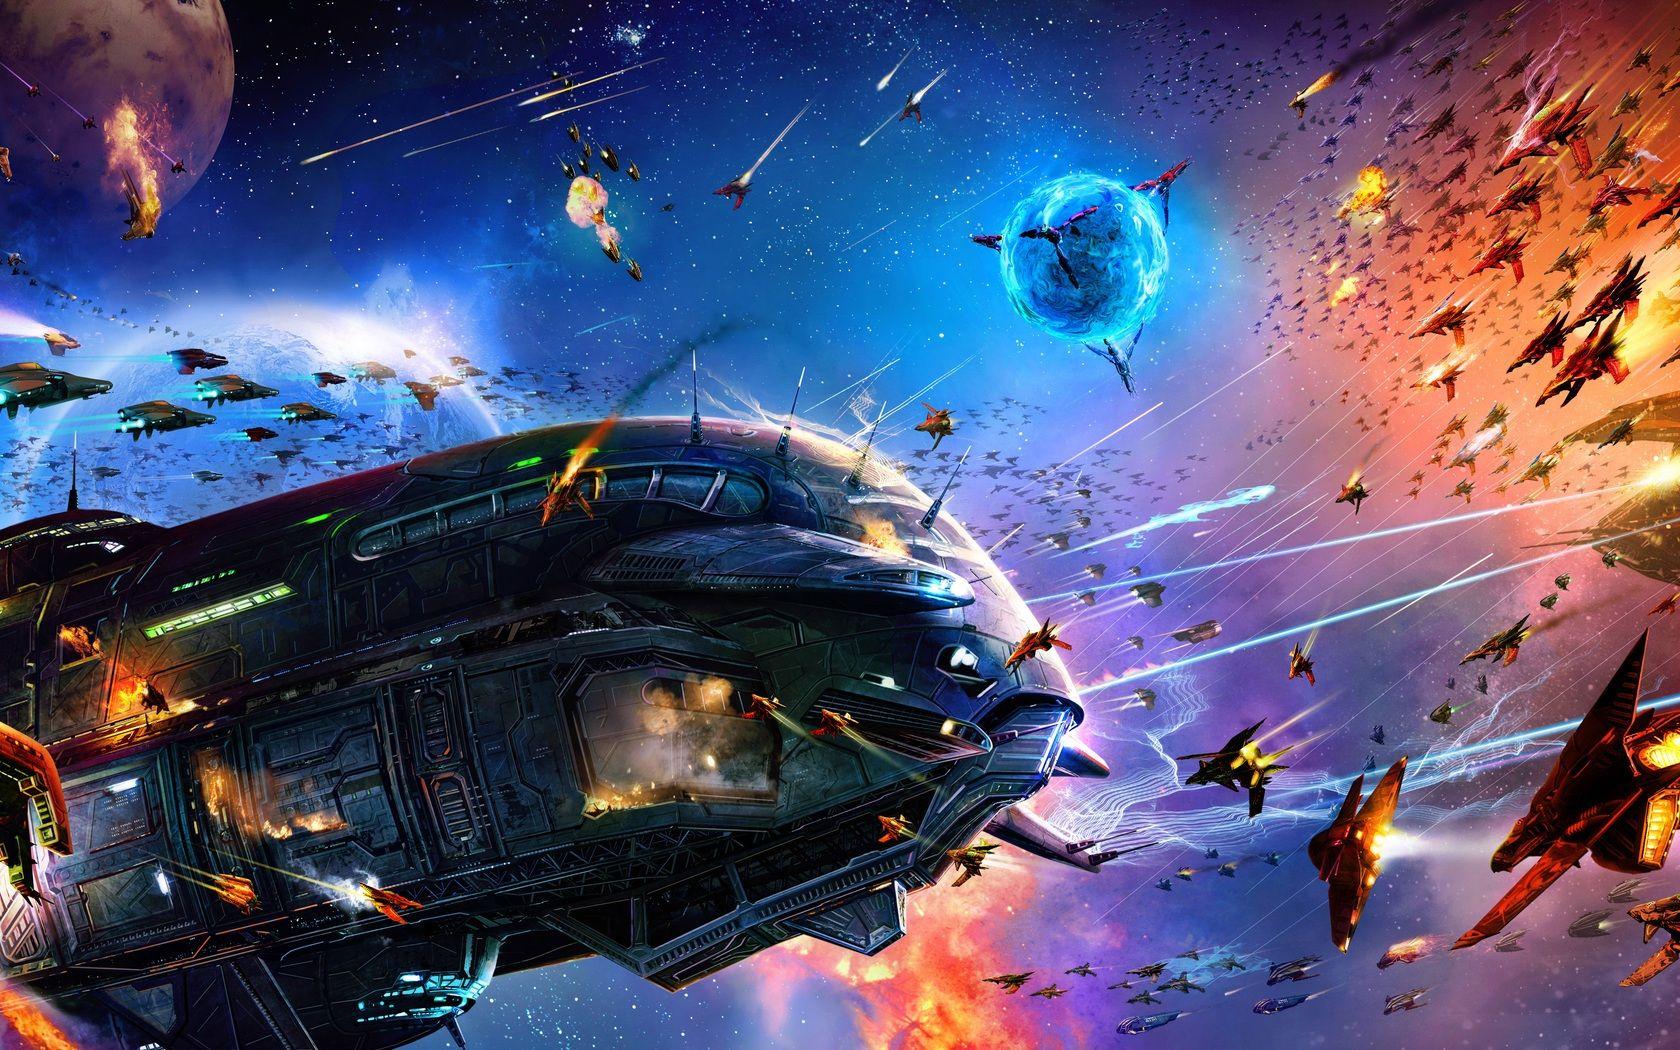 Sci Fi Spaceship Wallpaper 1680x1050 Px Free Download